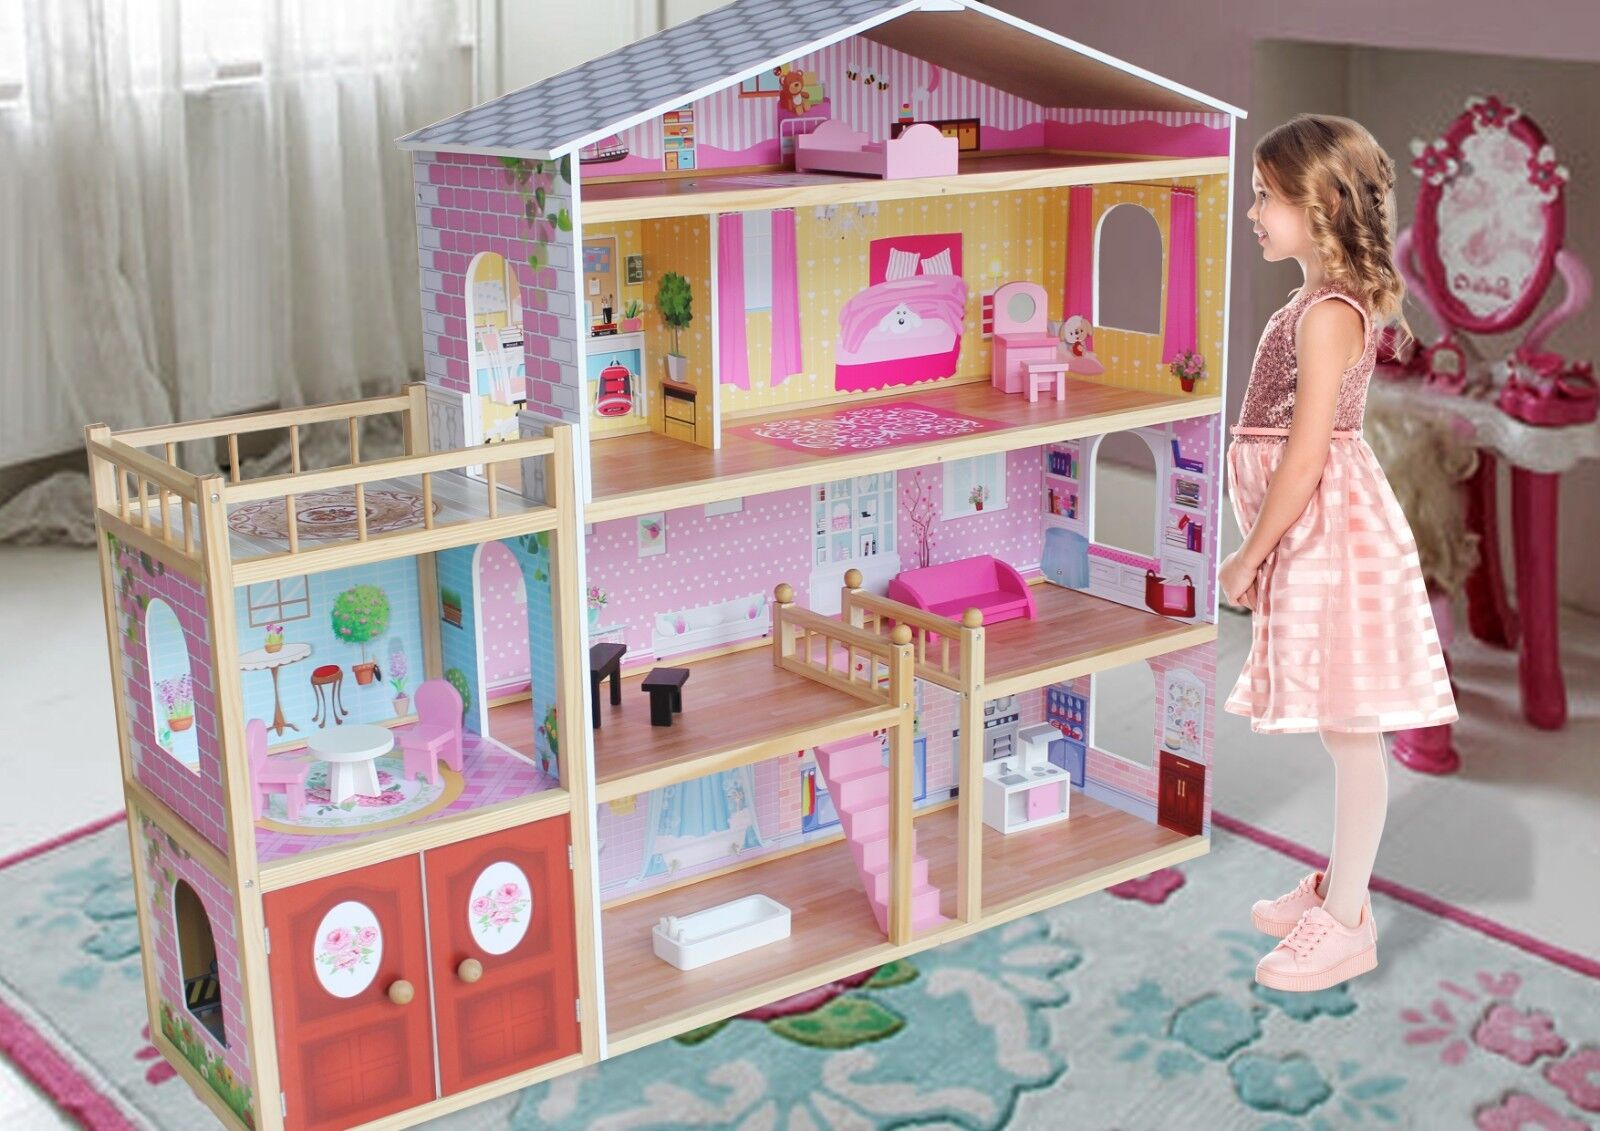 Kiddi Style Huge Modern Villa Dolls House Wooden & Furniture - Fits Barbie